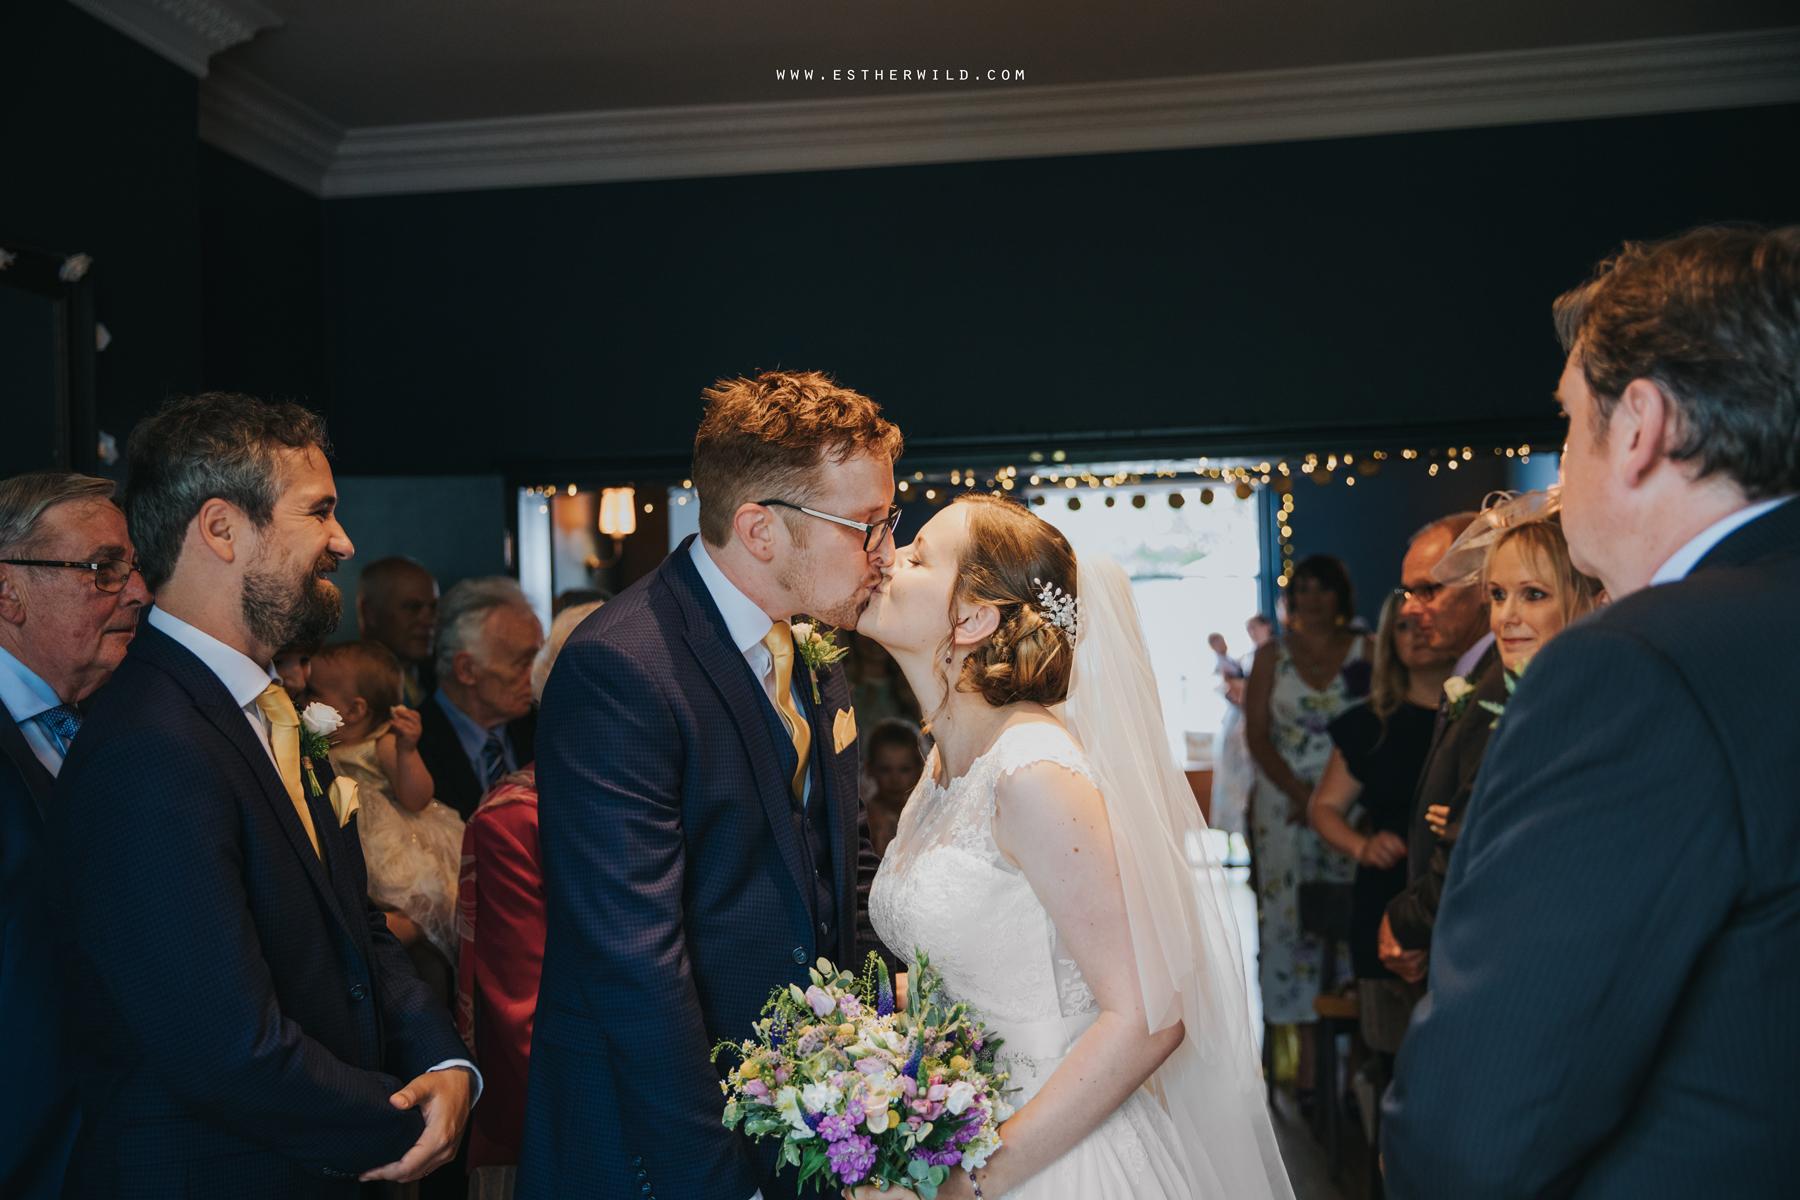 The_Georgian_Townhouse_Wedding_Norwich_Esther_Wild_Photographer_3R8A0880.jpg